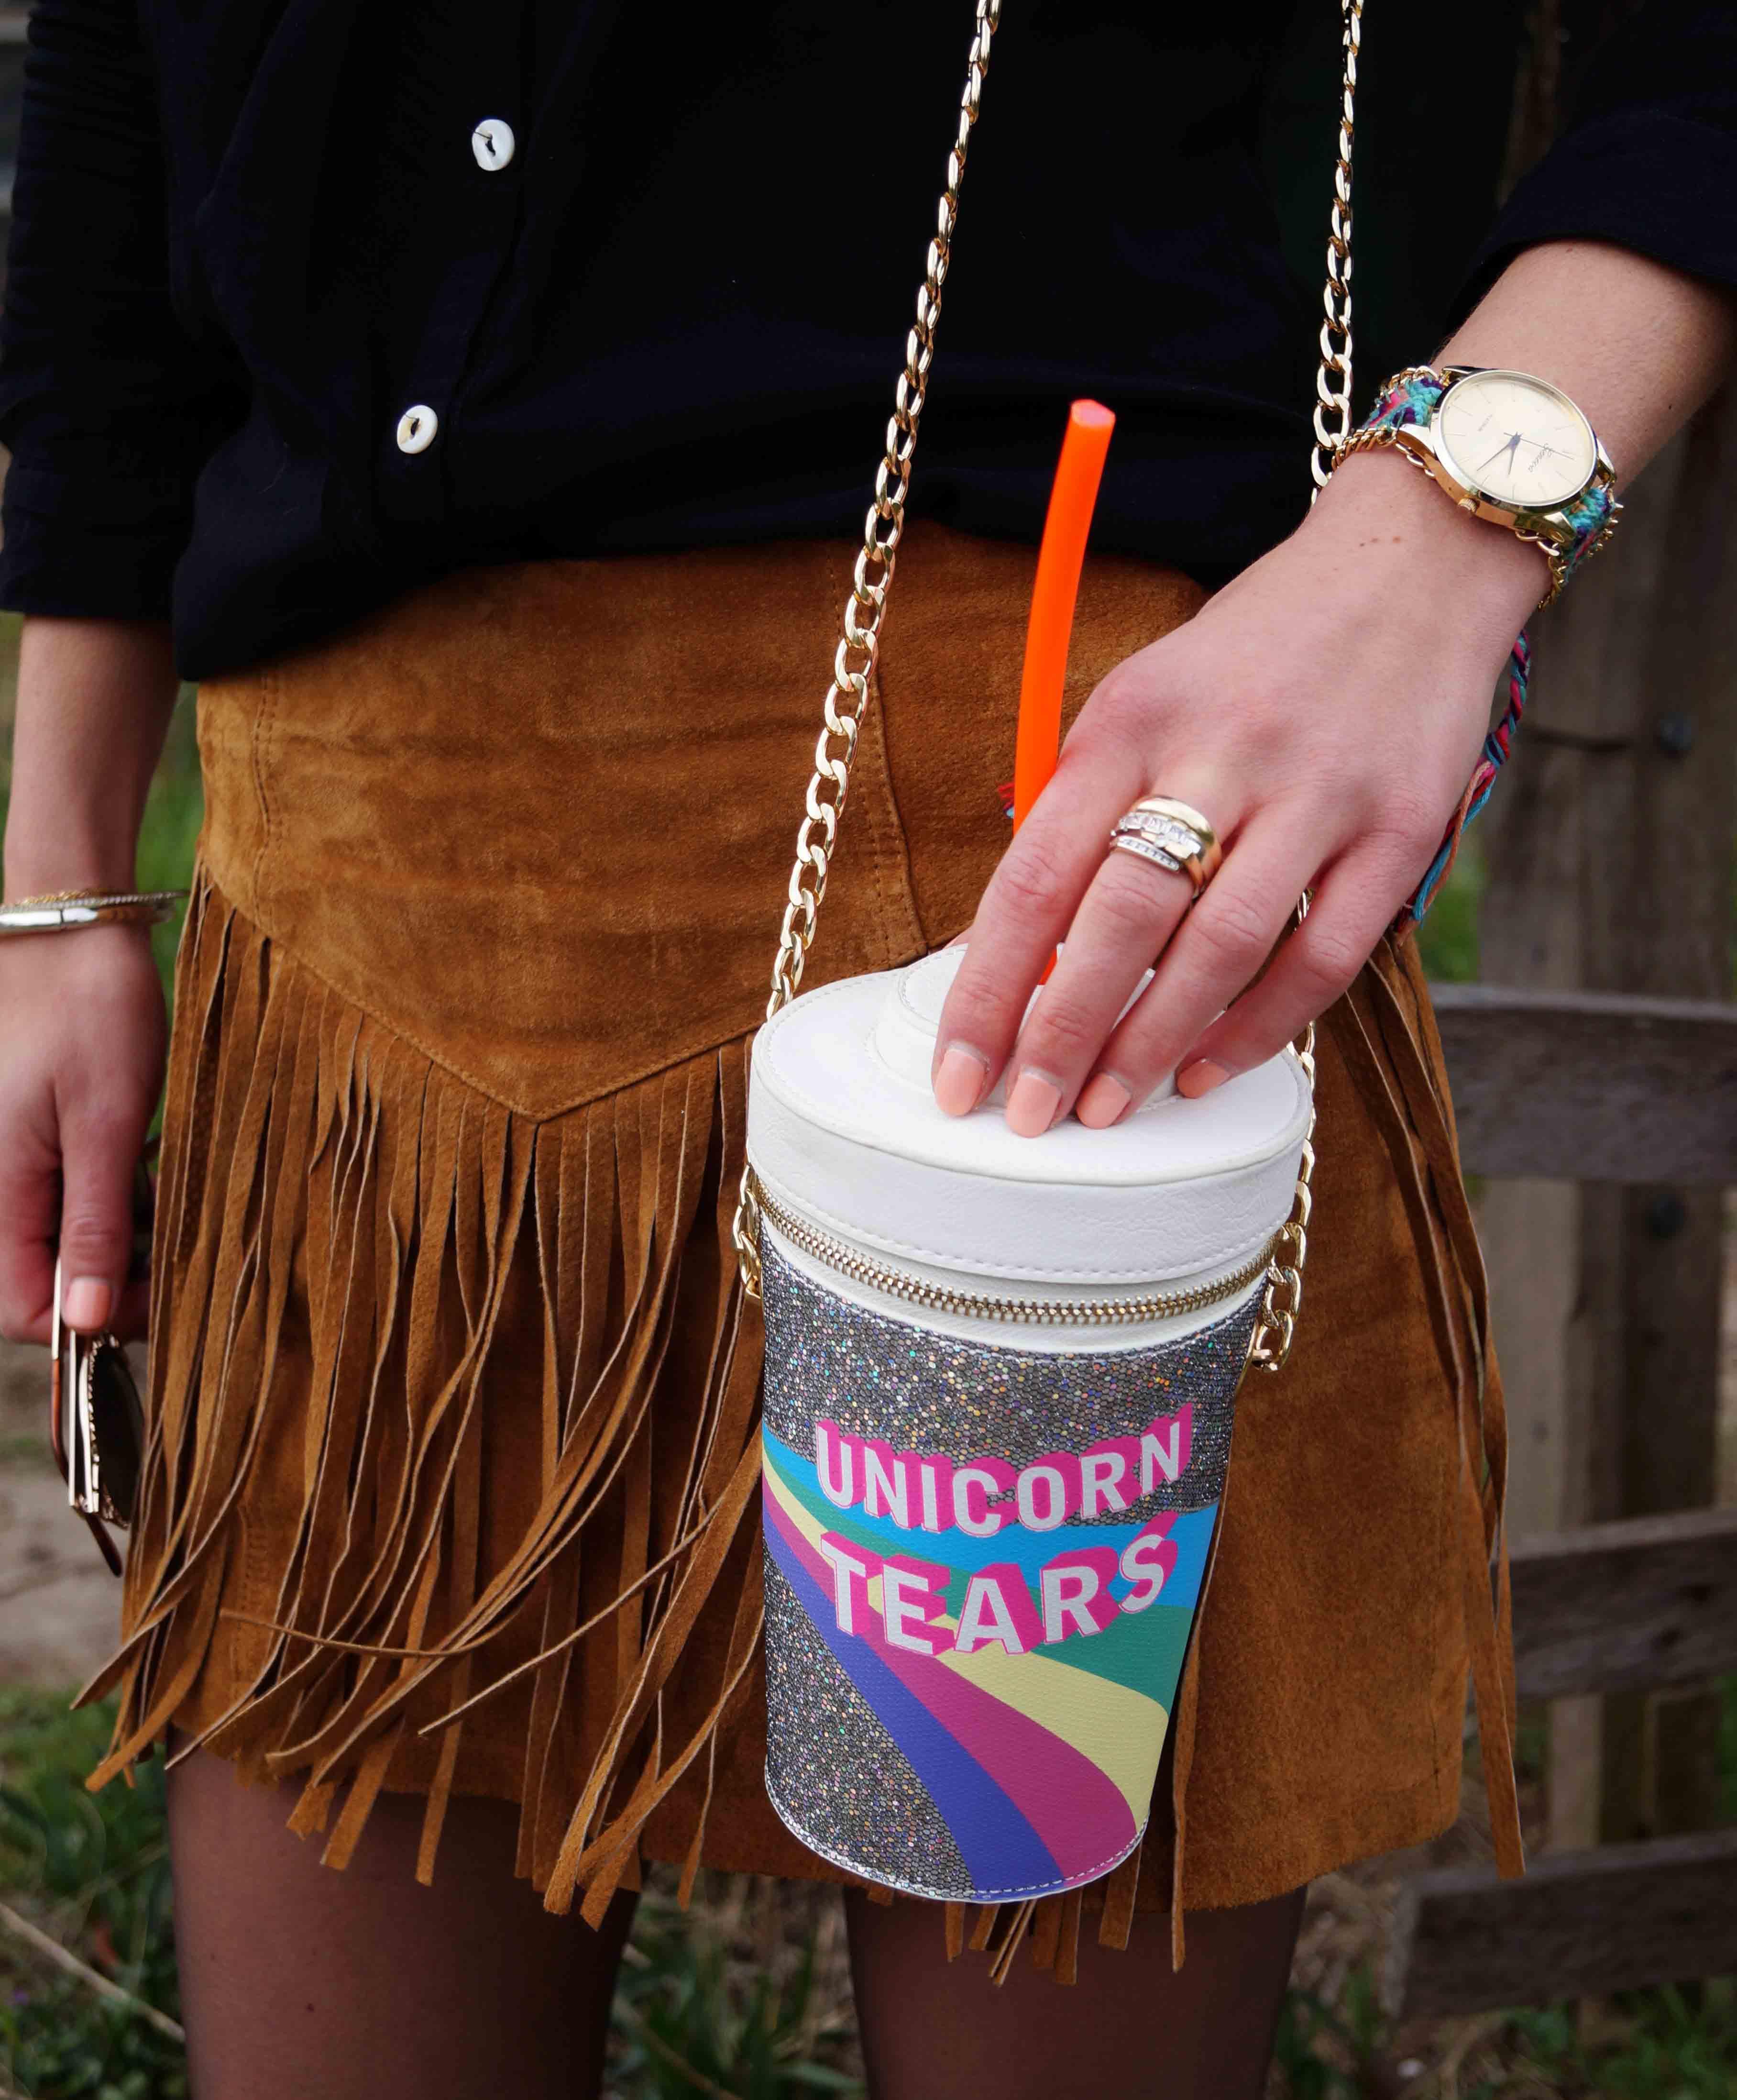 Bag at You - Fashion Blog - Festival tas - Party Look - Milkshake - Unicorn schoudertas